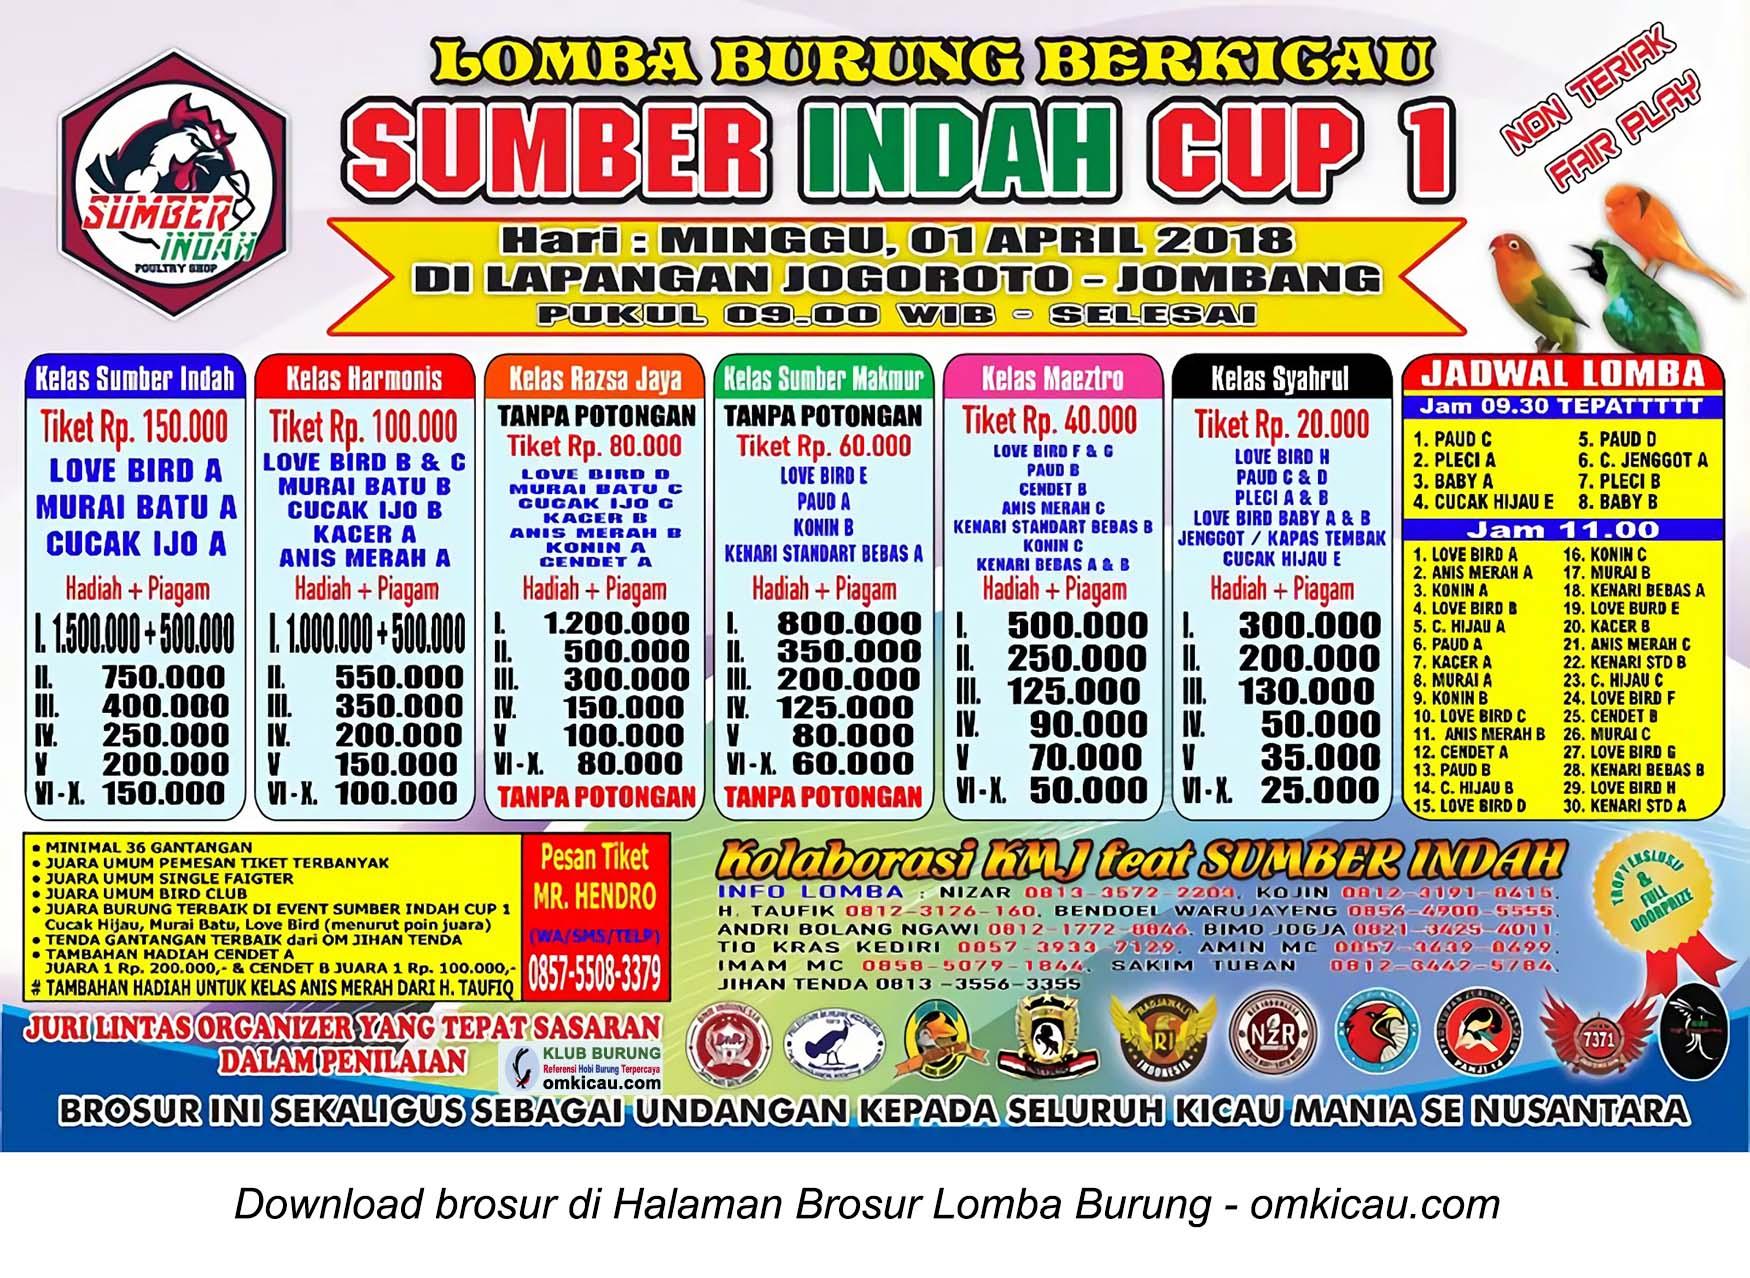 Sumber Indah Cup 1